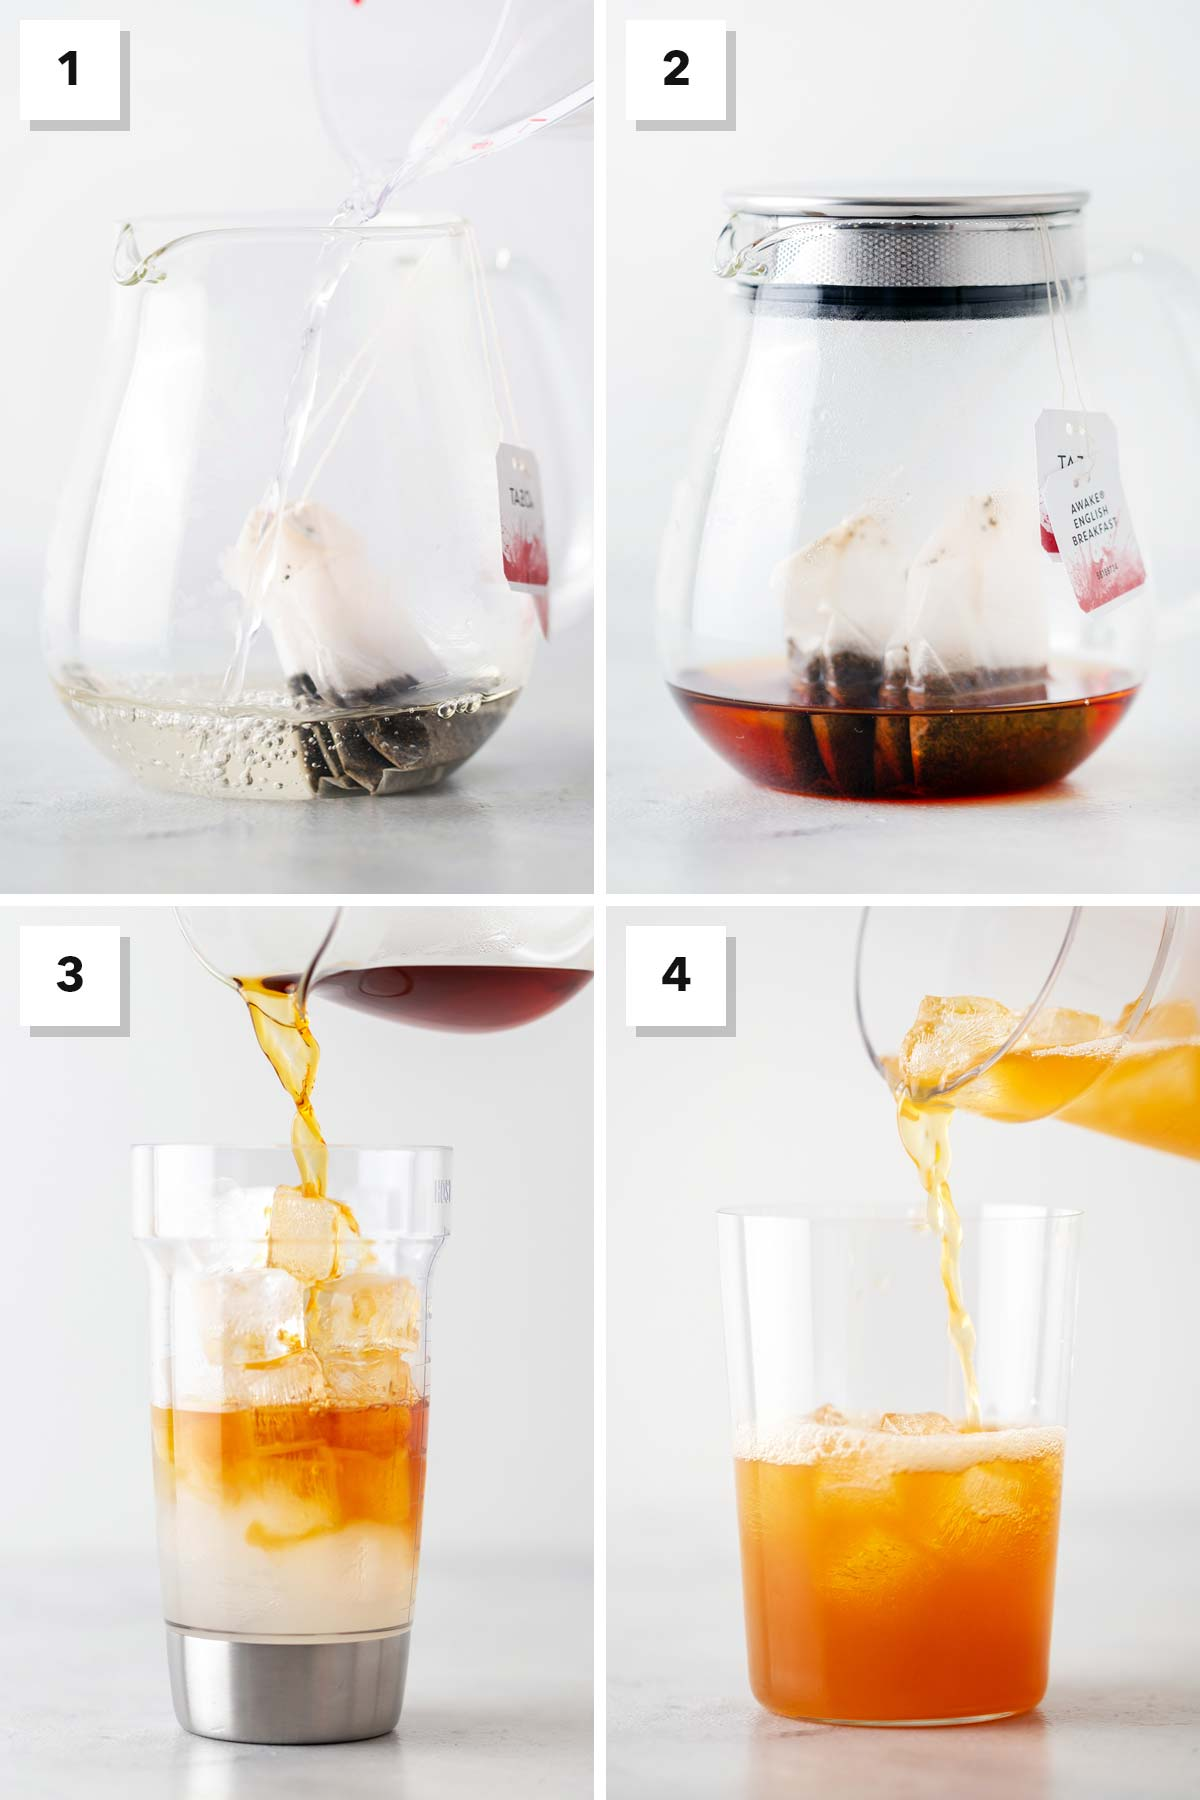 Four photo collage showing steps to make Iced Black Tea Lemonade.